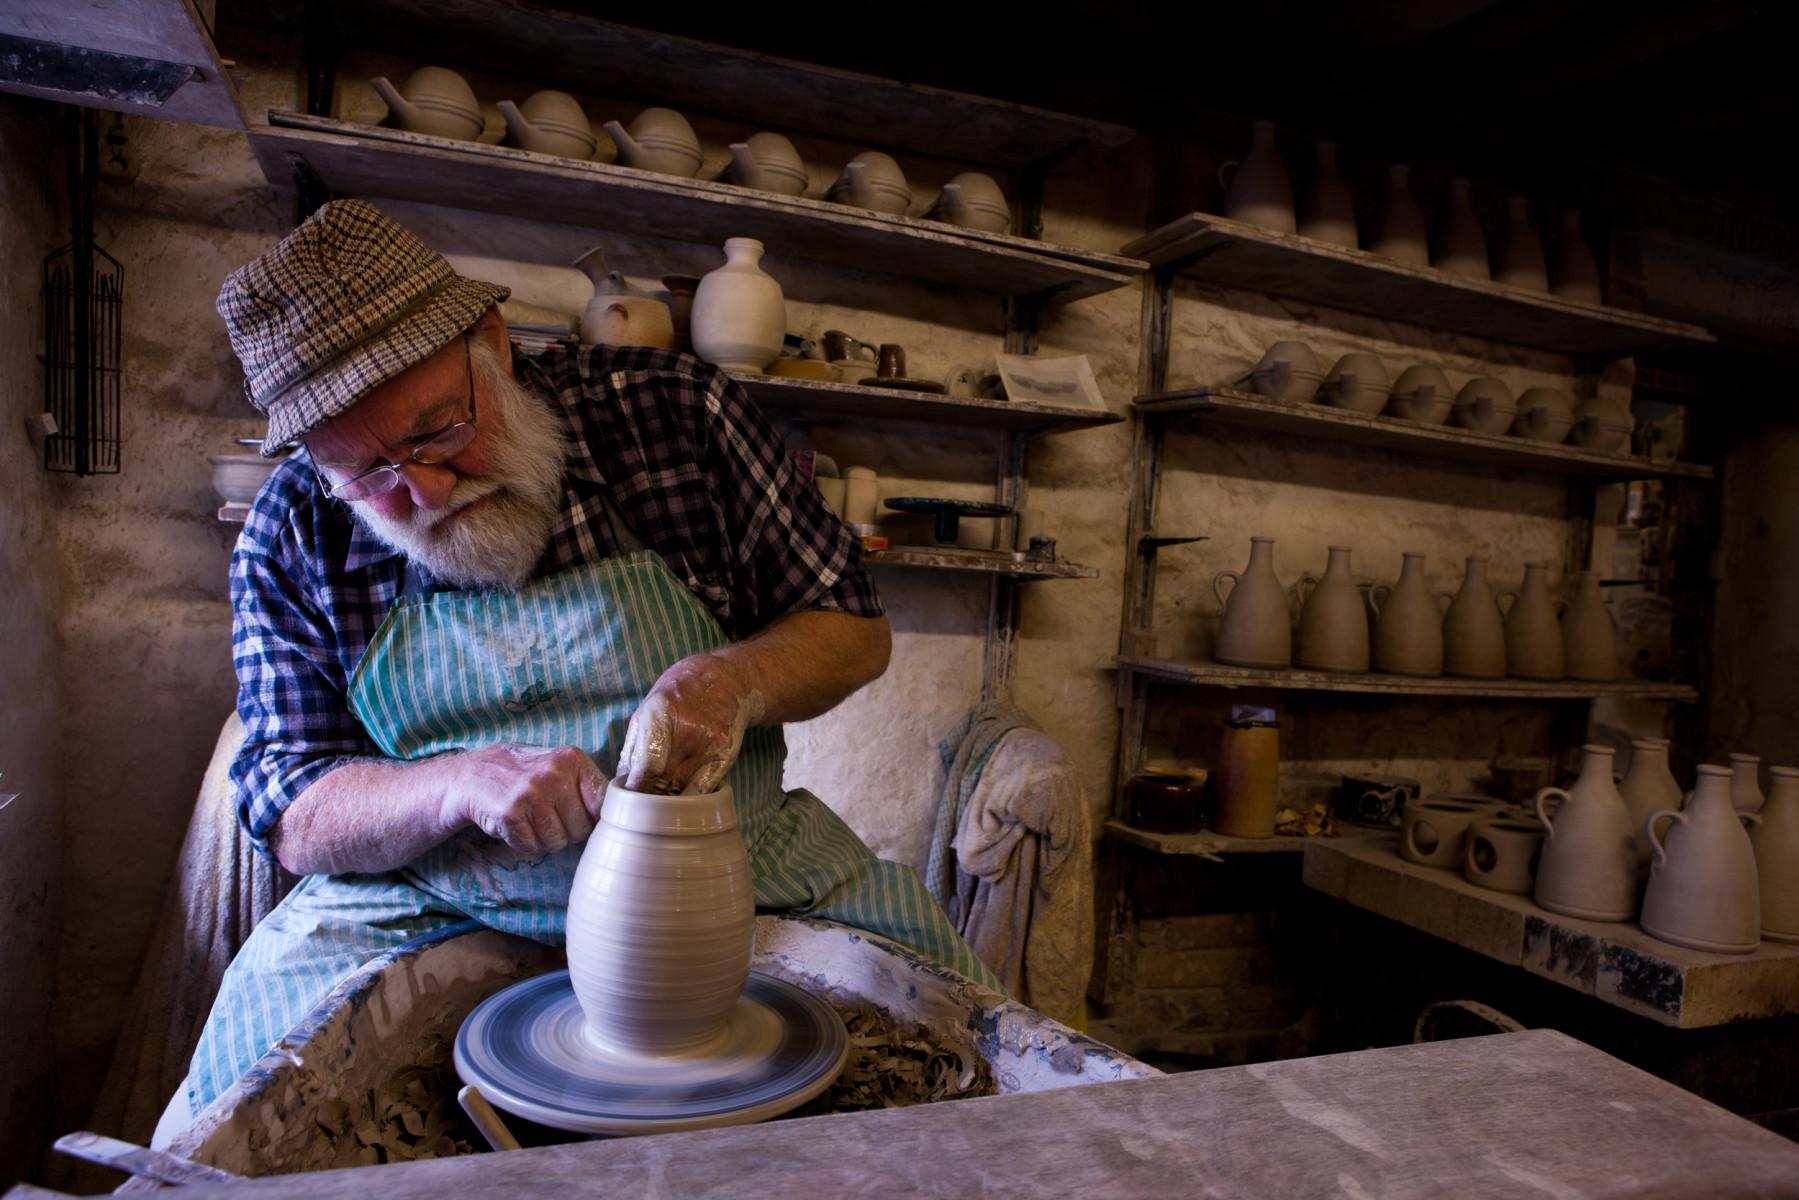 John Leach potter's wheel